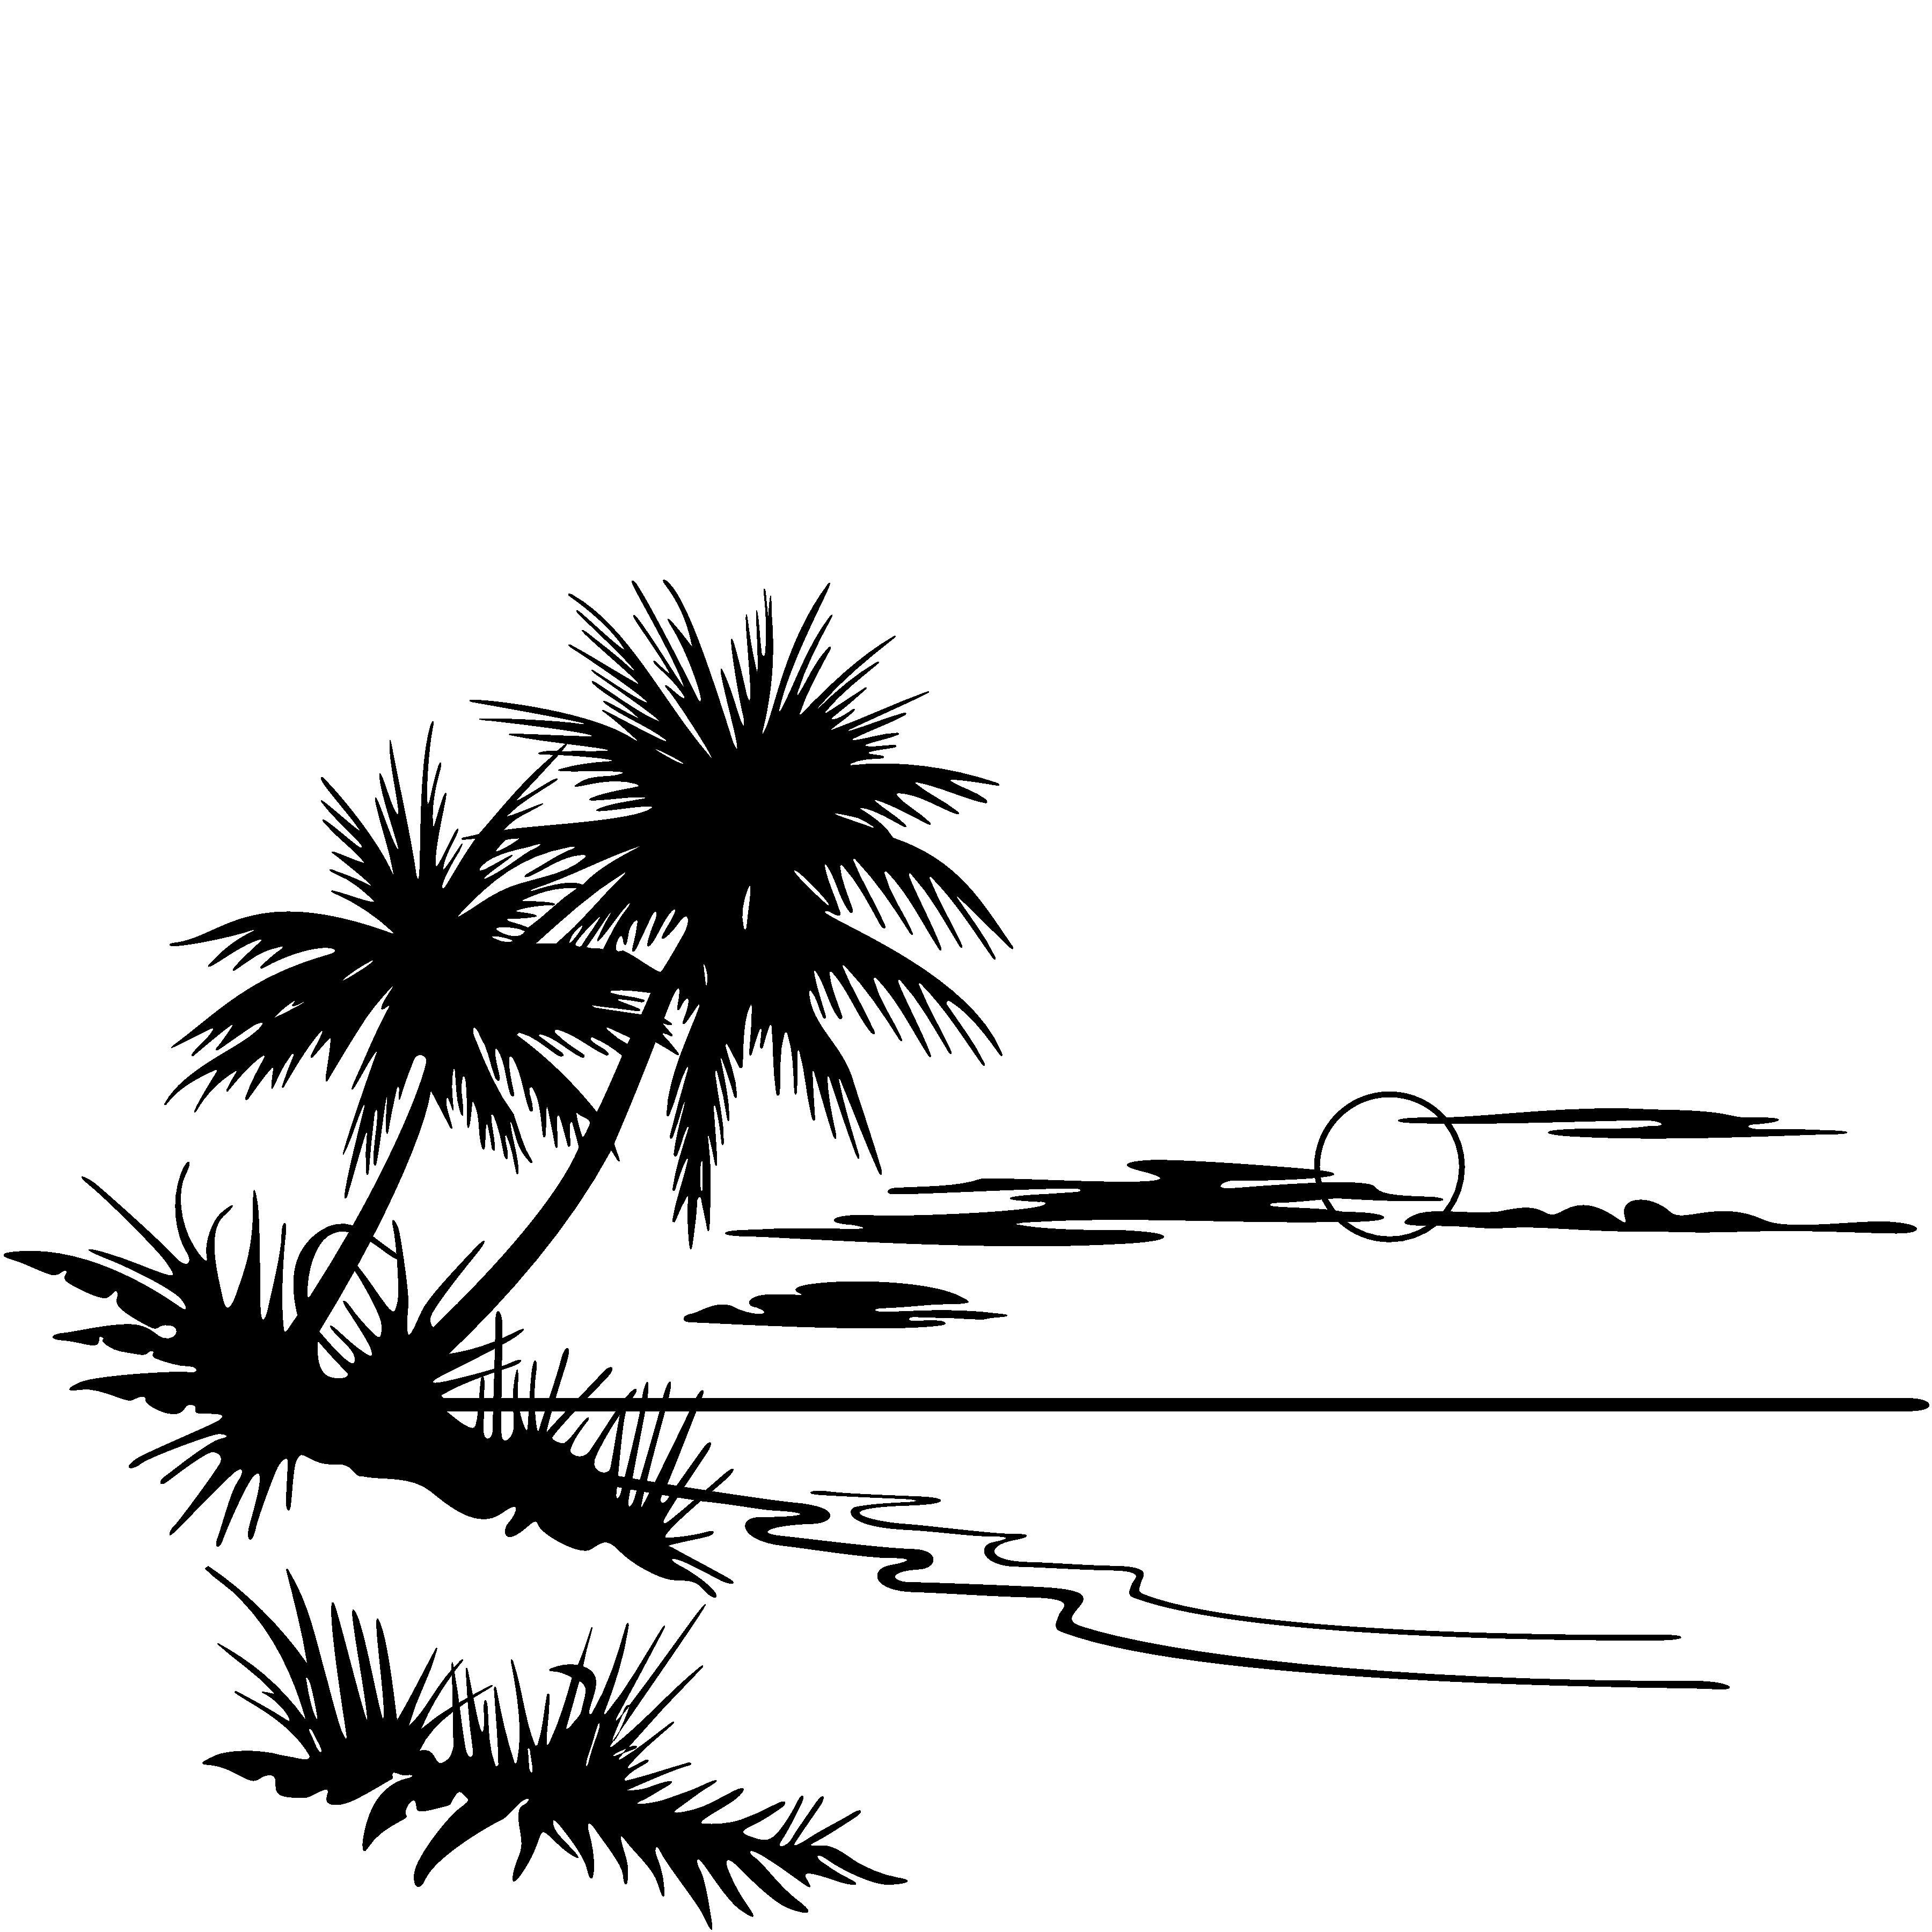 Ocean Clipart Black And White | Clipart Panda - Free ...